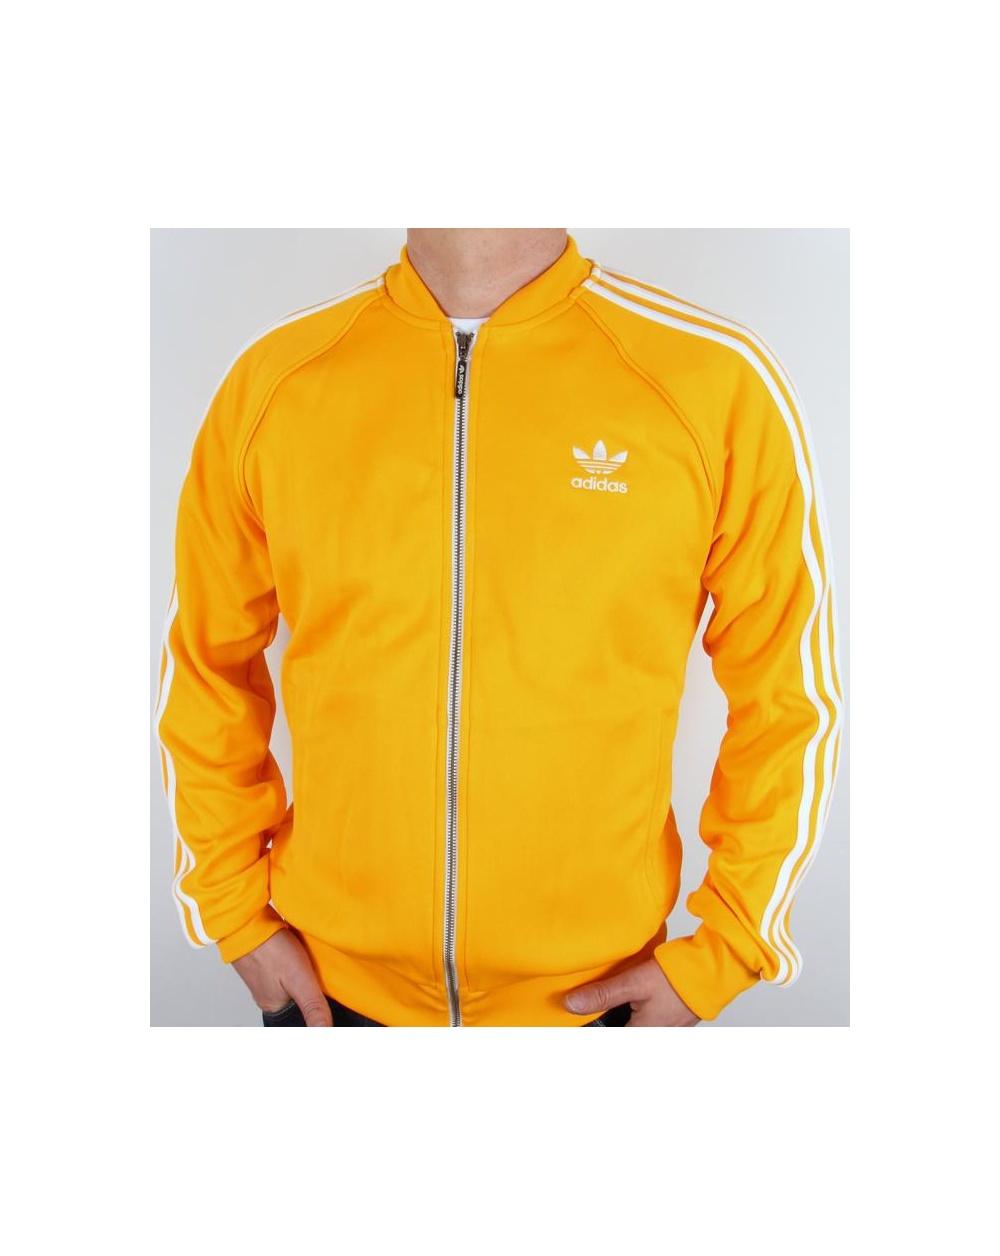 4c6cd39e28d4 Adidas Yellow Tracksuit thehampsteadfactory.co.uk